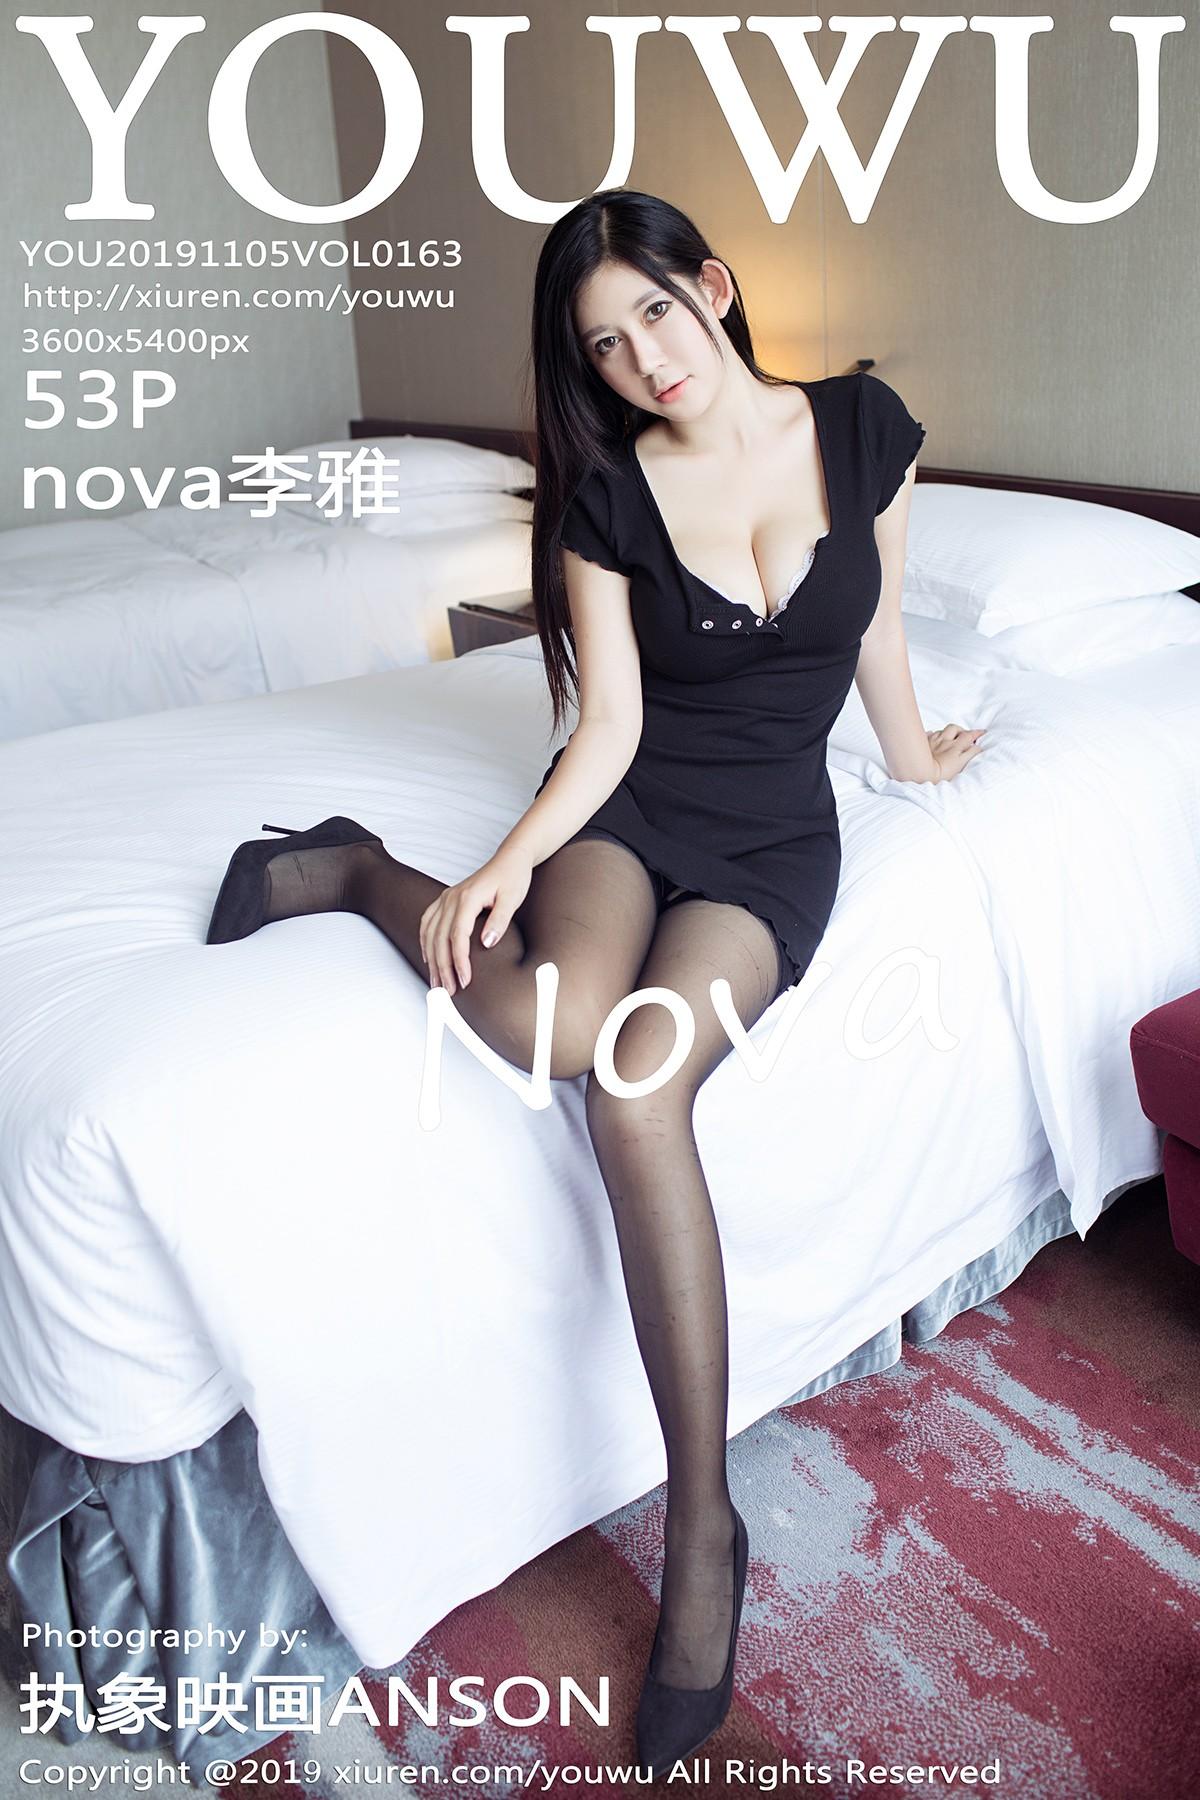 [YouWu尤物馆] 2019.11.05 VOL.163 魅惑黑丝与网袜 nova李雅